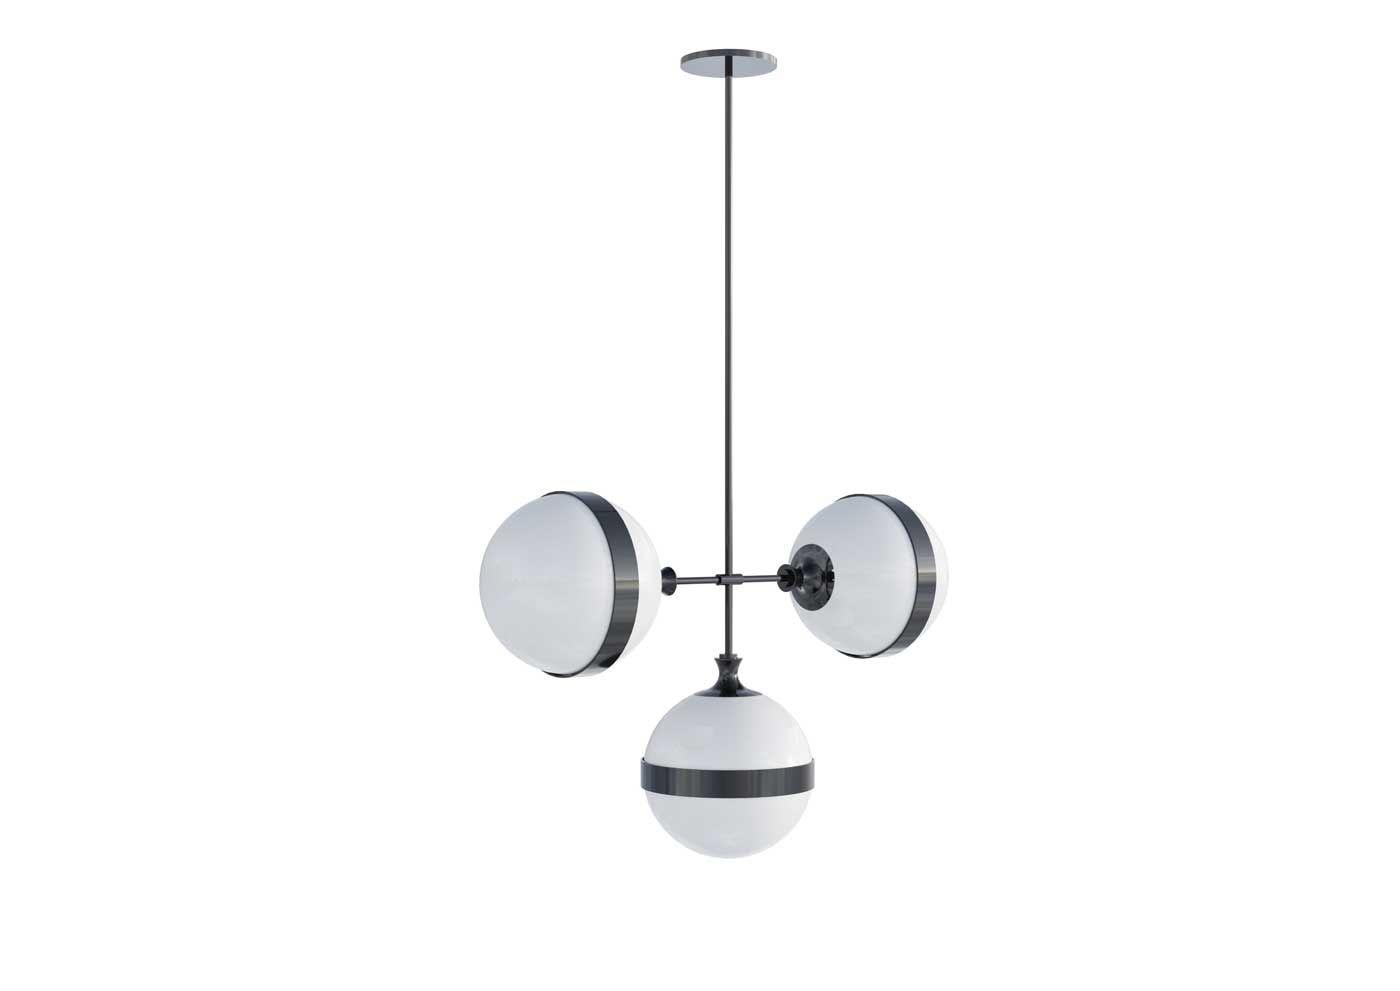 Peggy Futura Lamp Gessato Lamp Modern Hanging Lights Vistosi